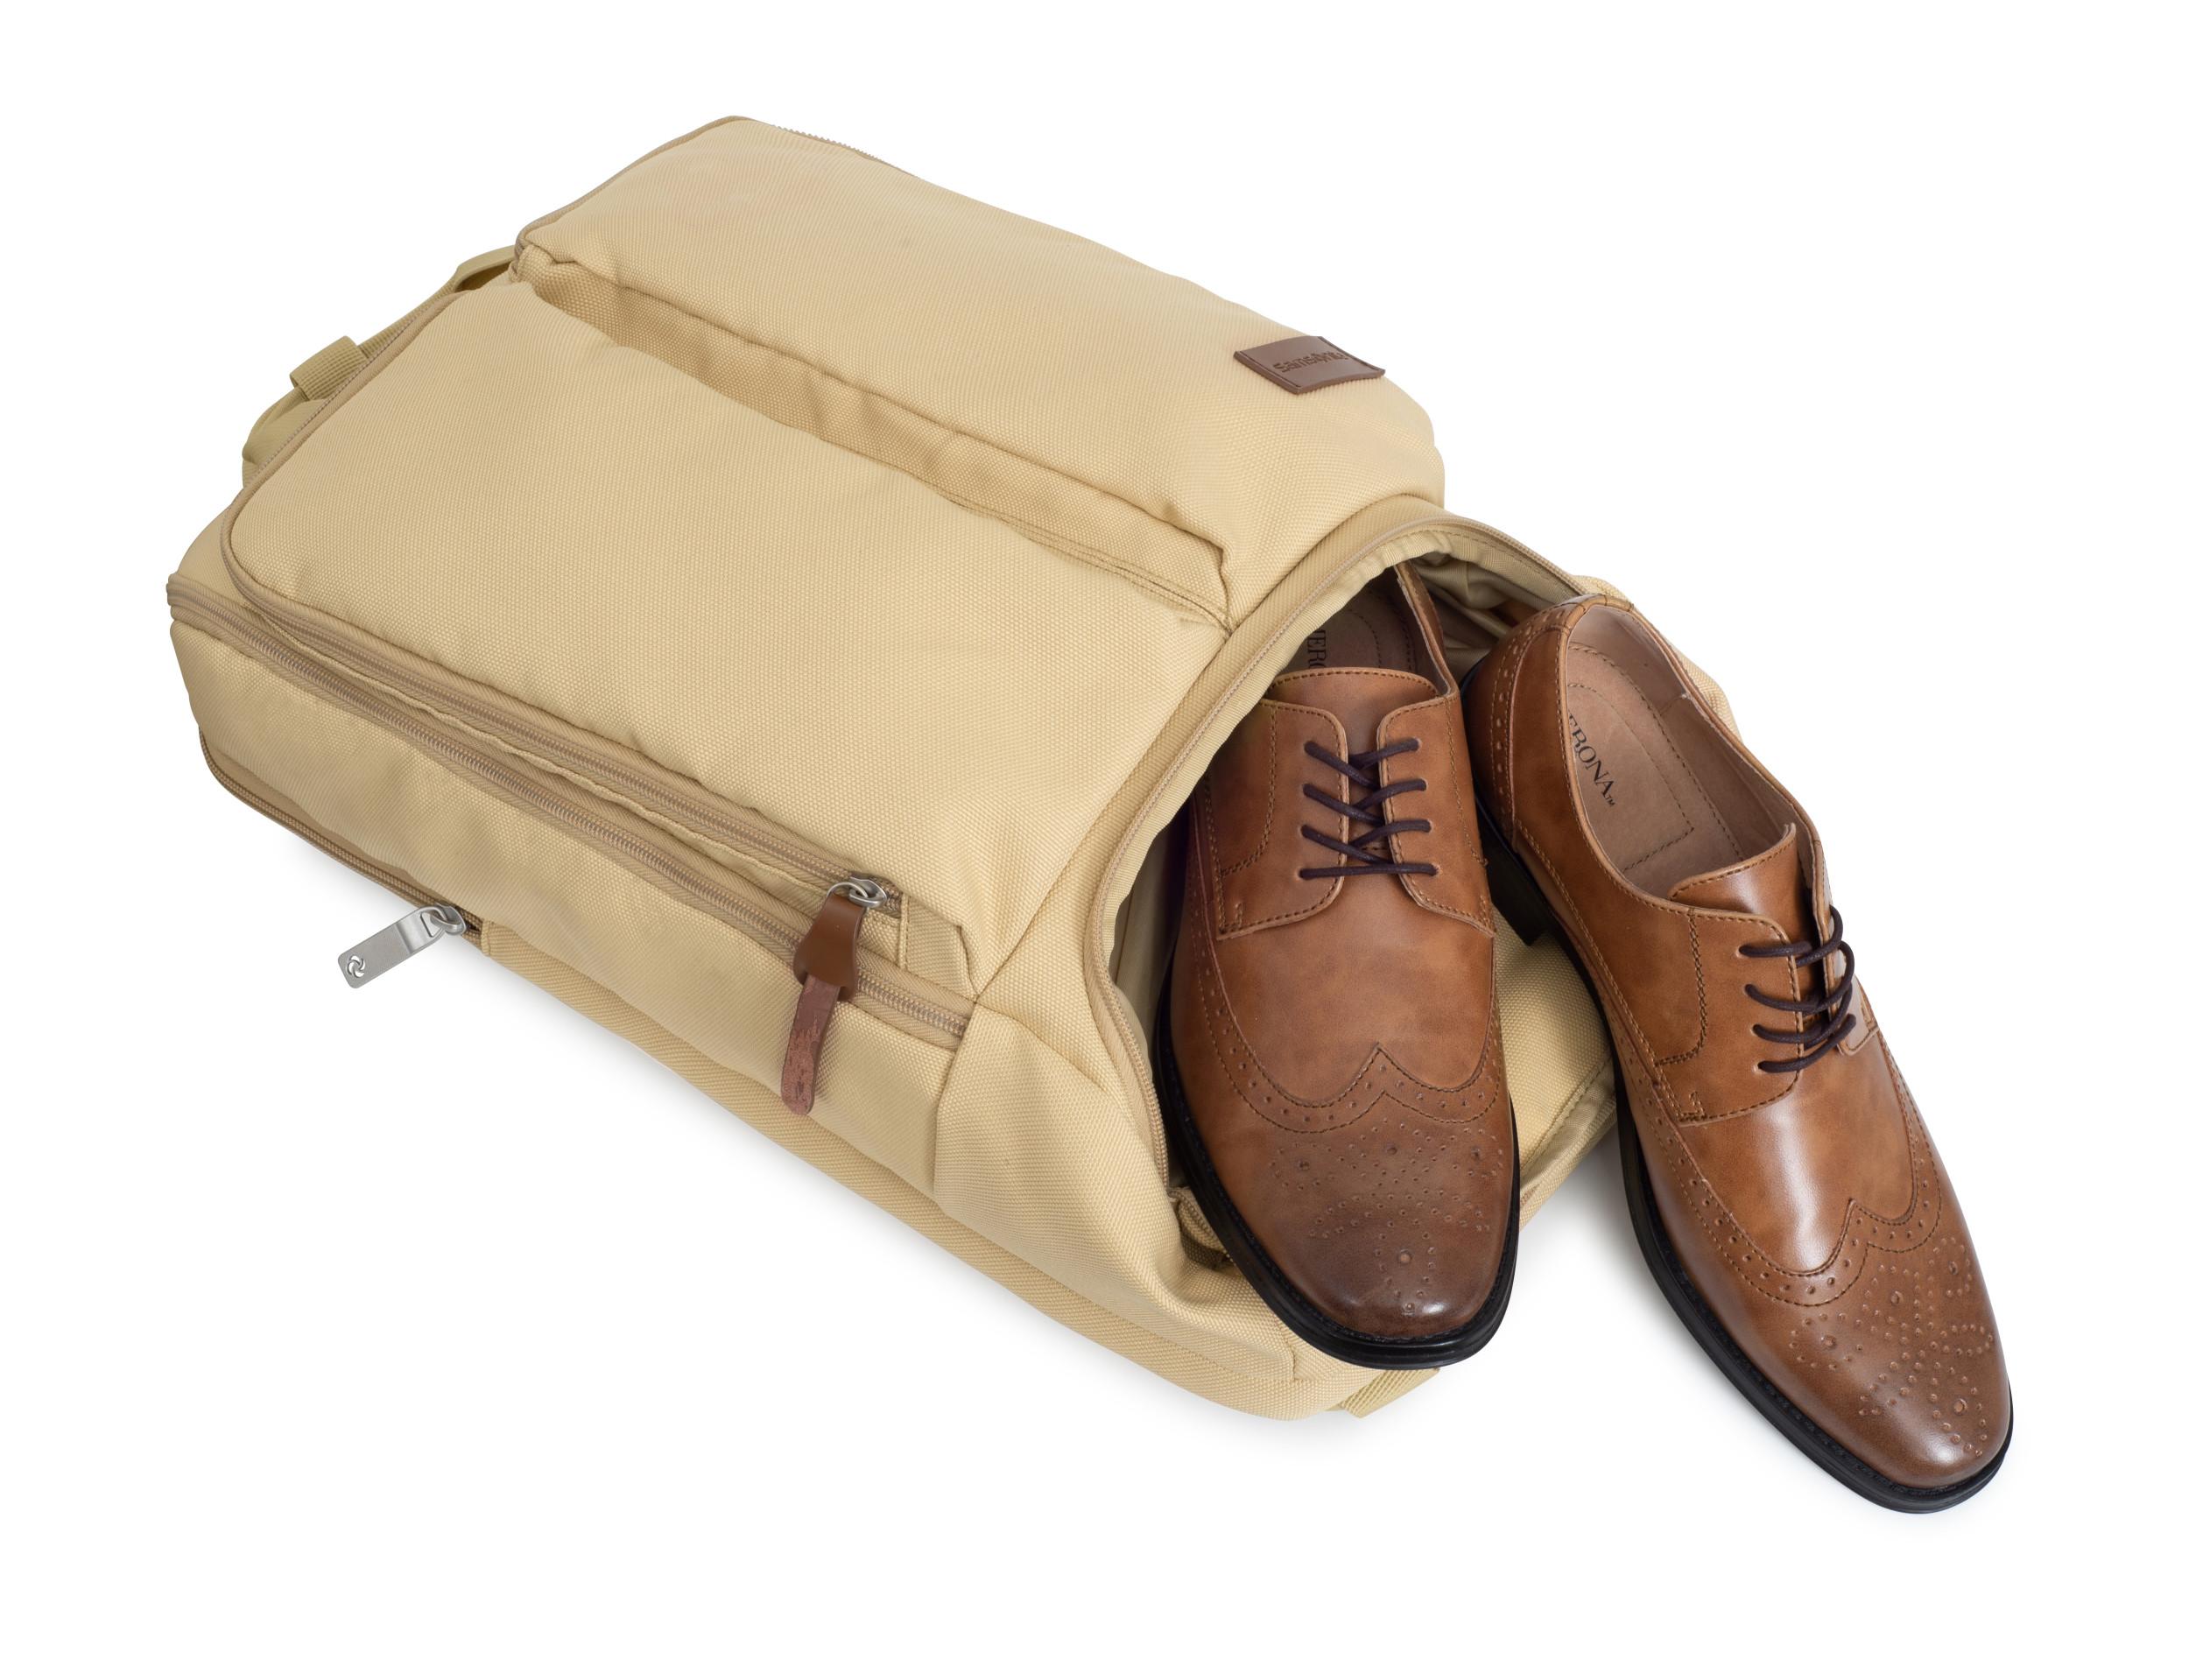 Cargo pockets for exterior organization, integrated shoe pocket, and interior organization. Top grab handles for an alternative carry option.